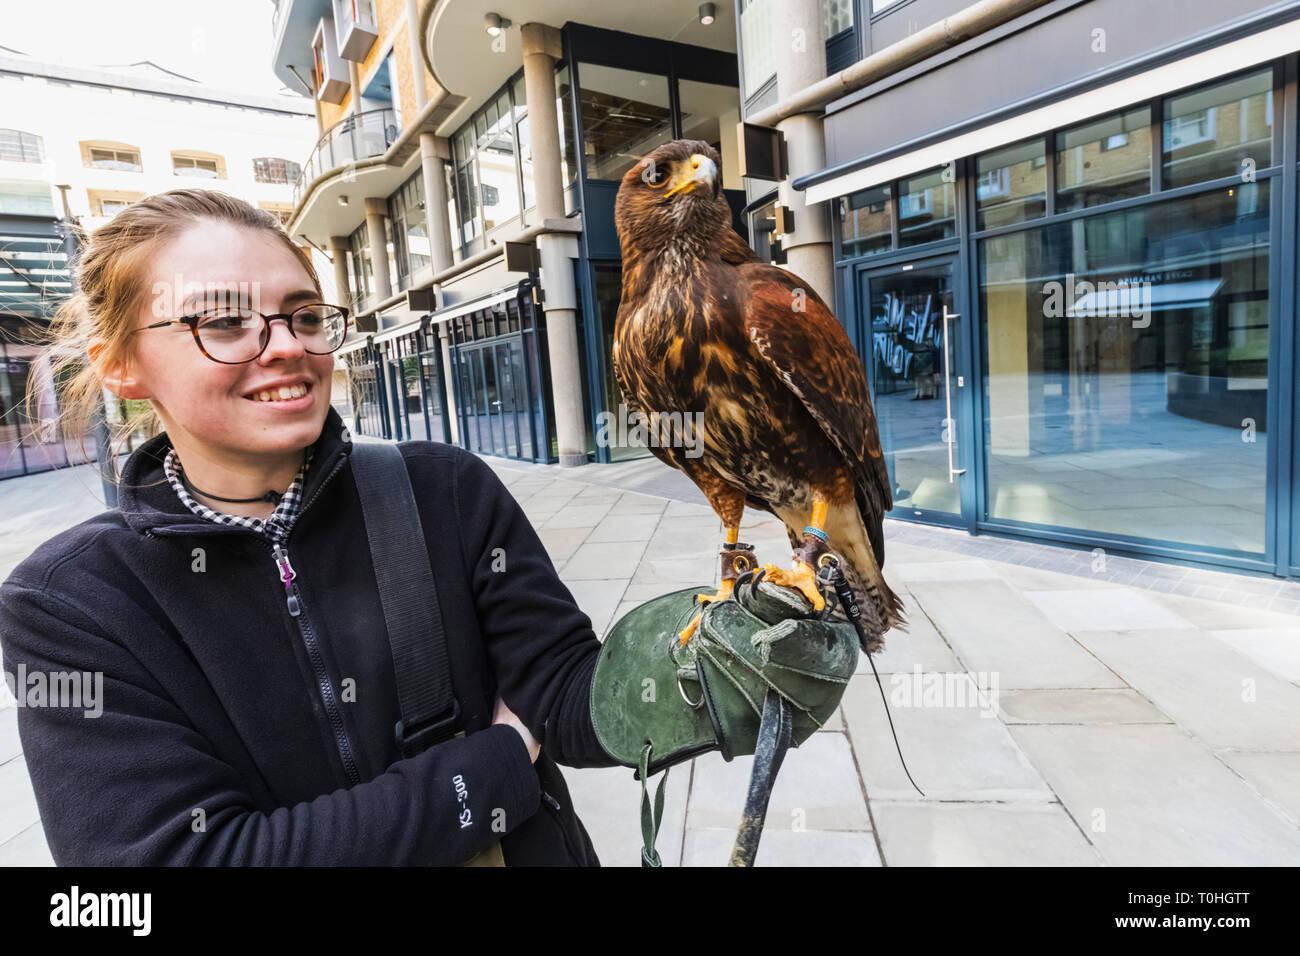 England, London, Southwark, Falconer Using Falcon for Pigeon Control Stock Photo